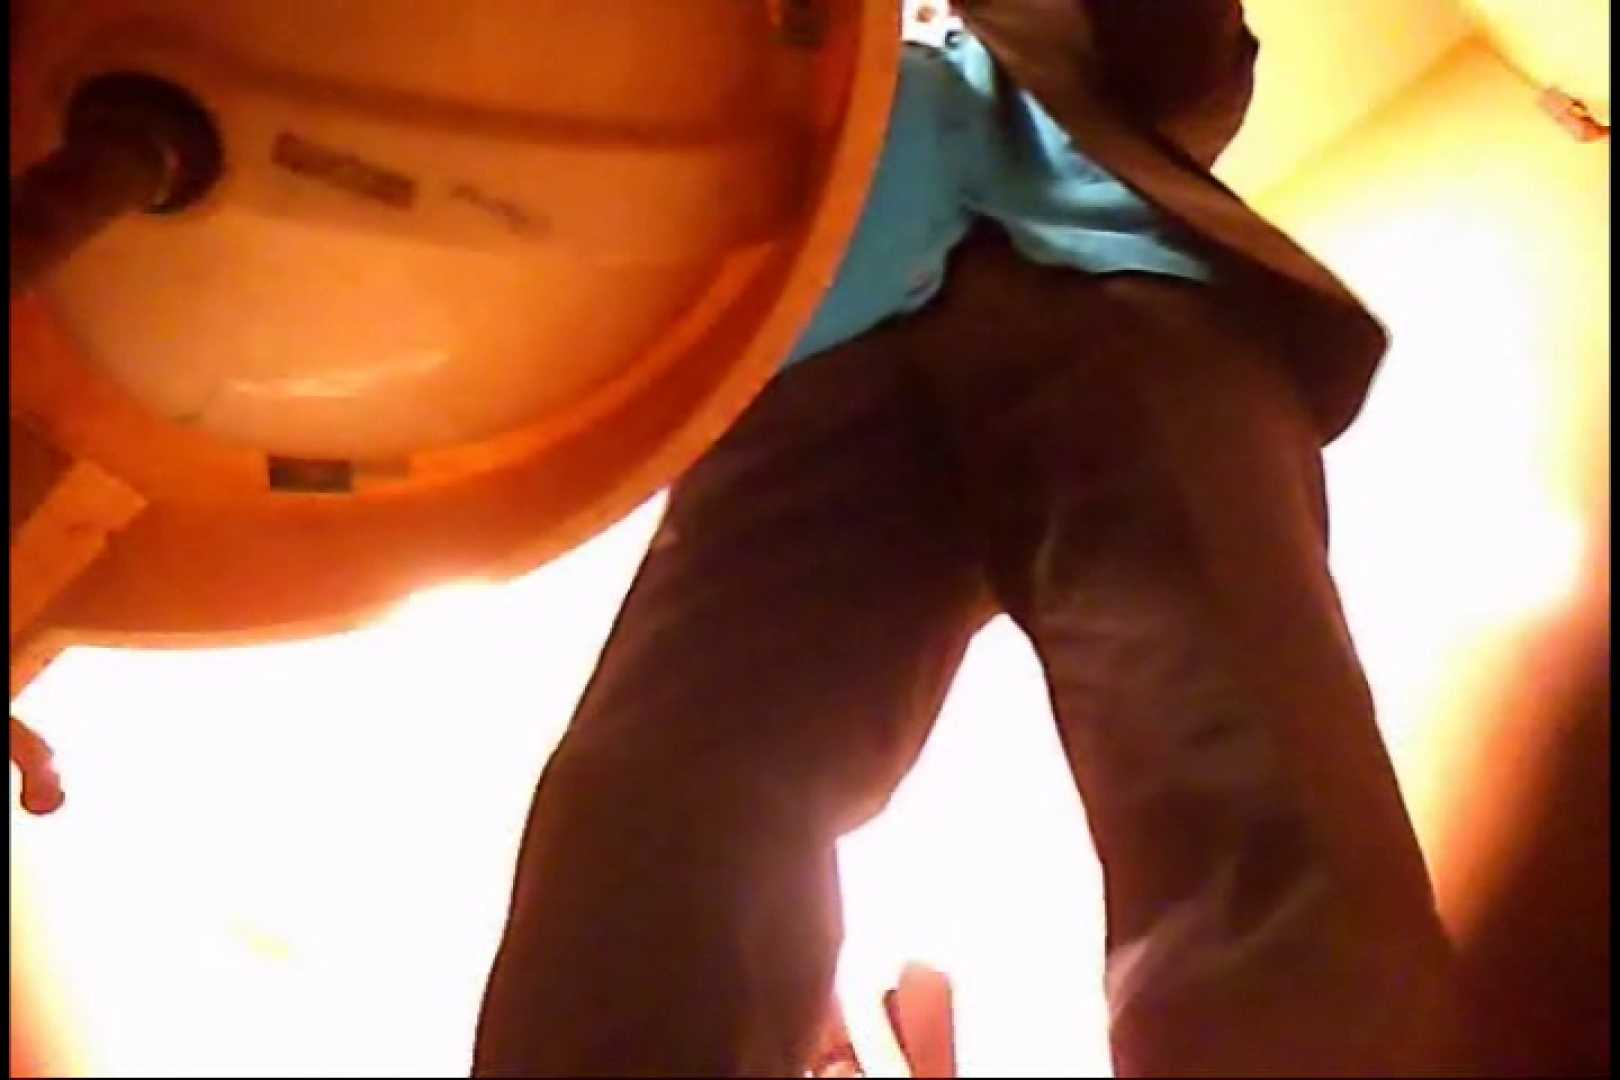 Gボーイ初投稿!掴み取りさんの洗面所覗き!in新幹線!VOL.04 覗きシーン ゲイ丸見え画像 65枚 36